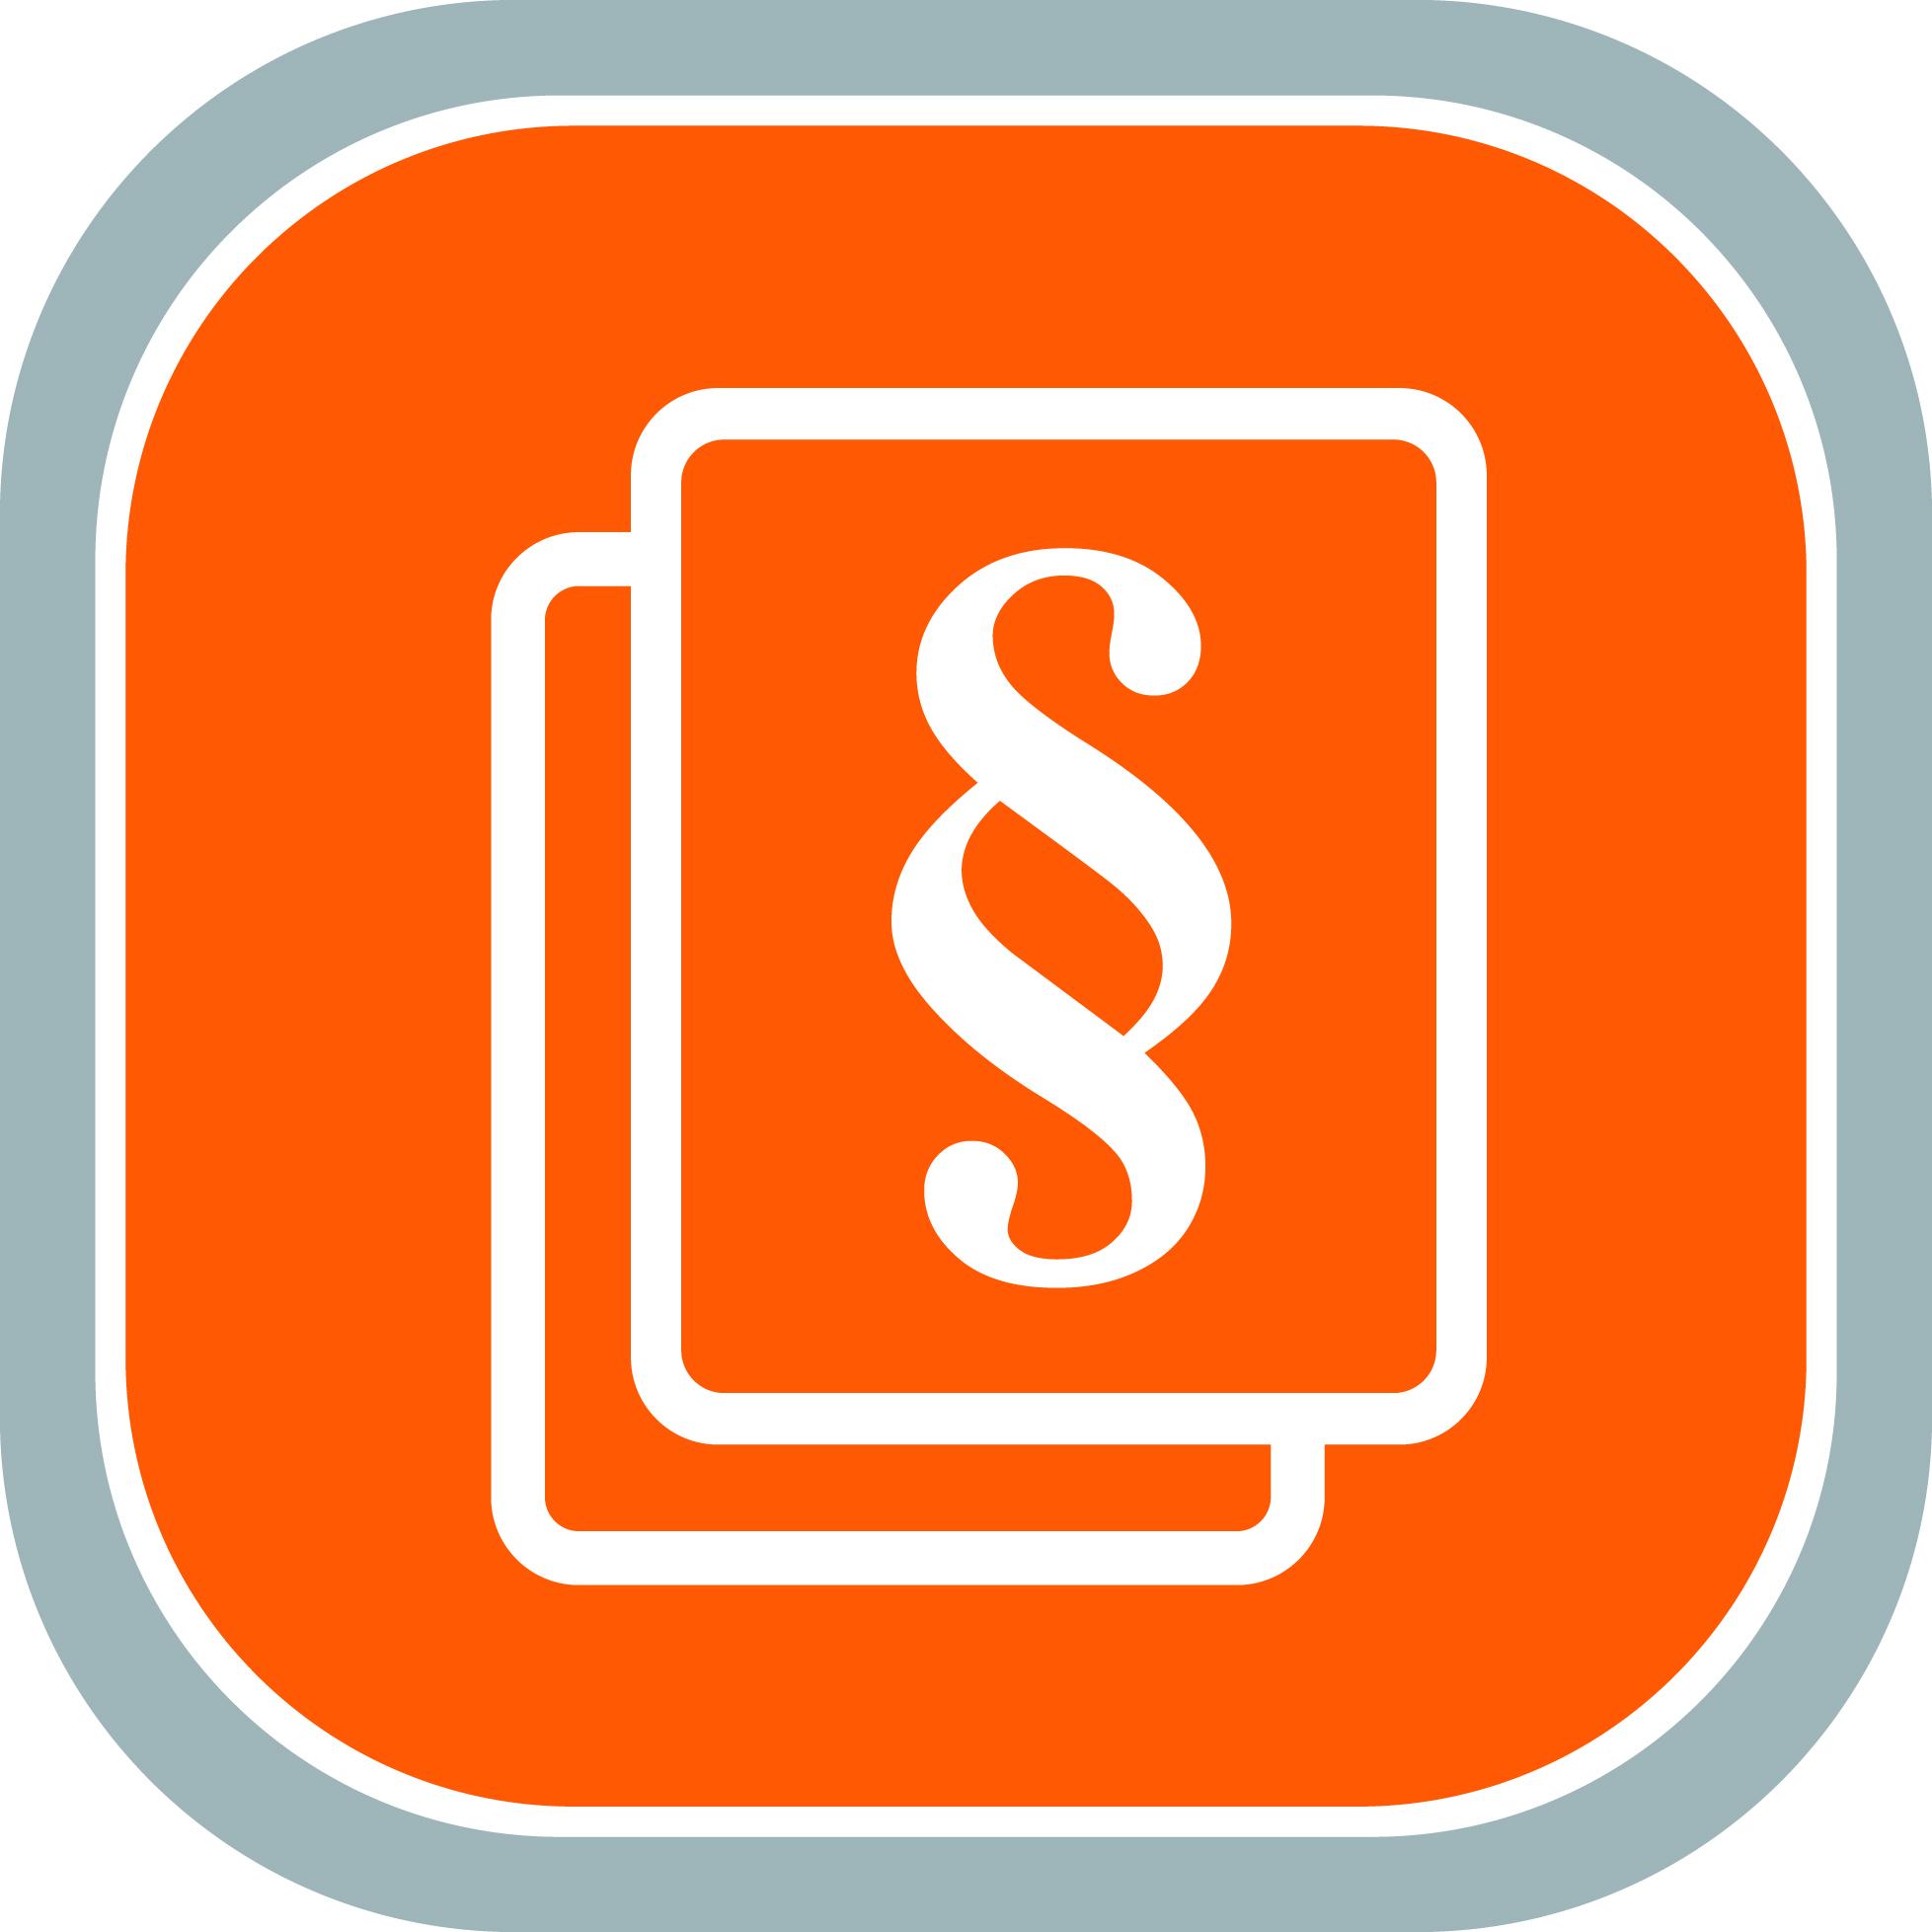 Poplatky a dane logo